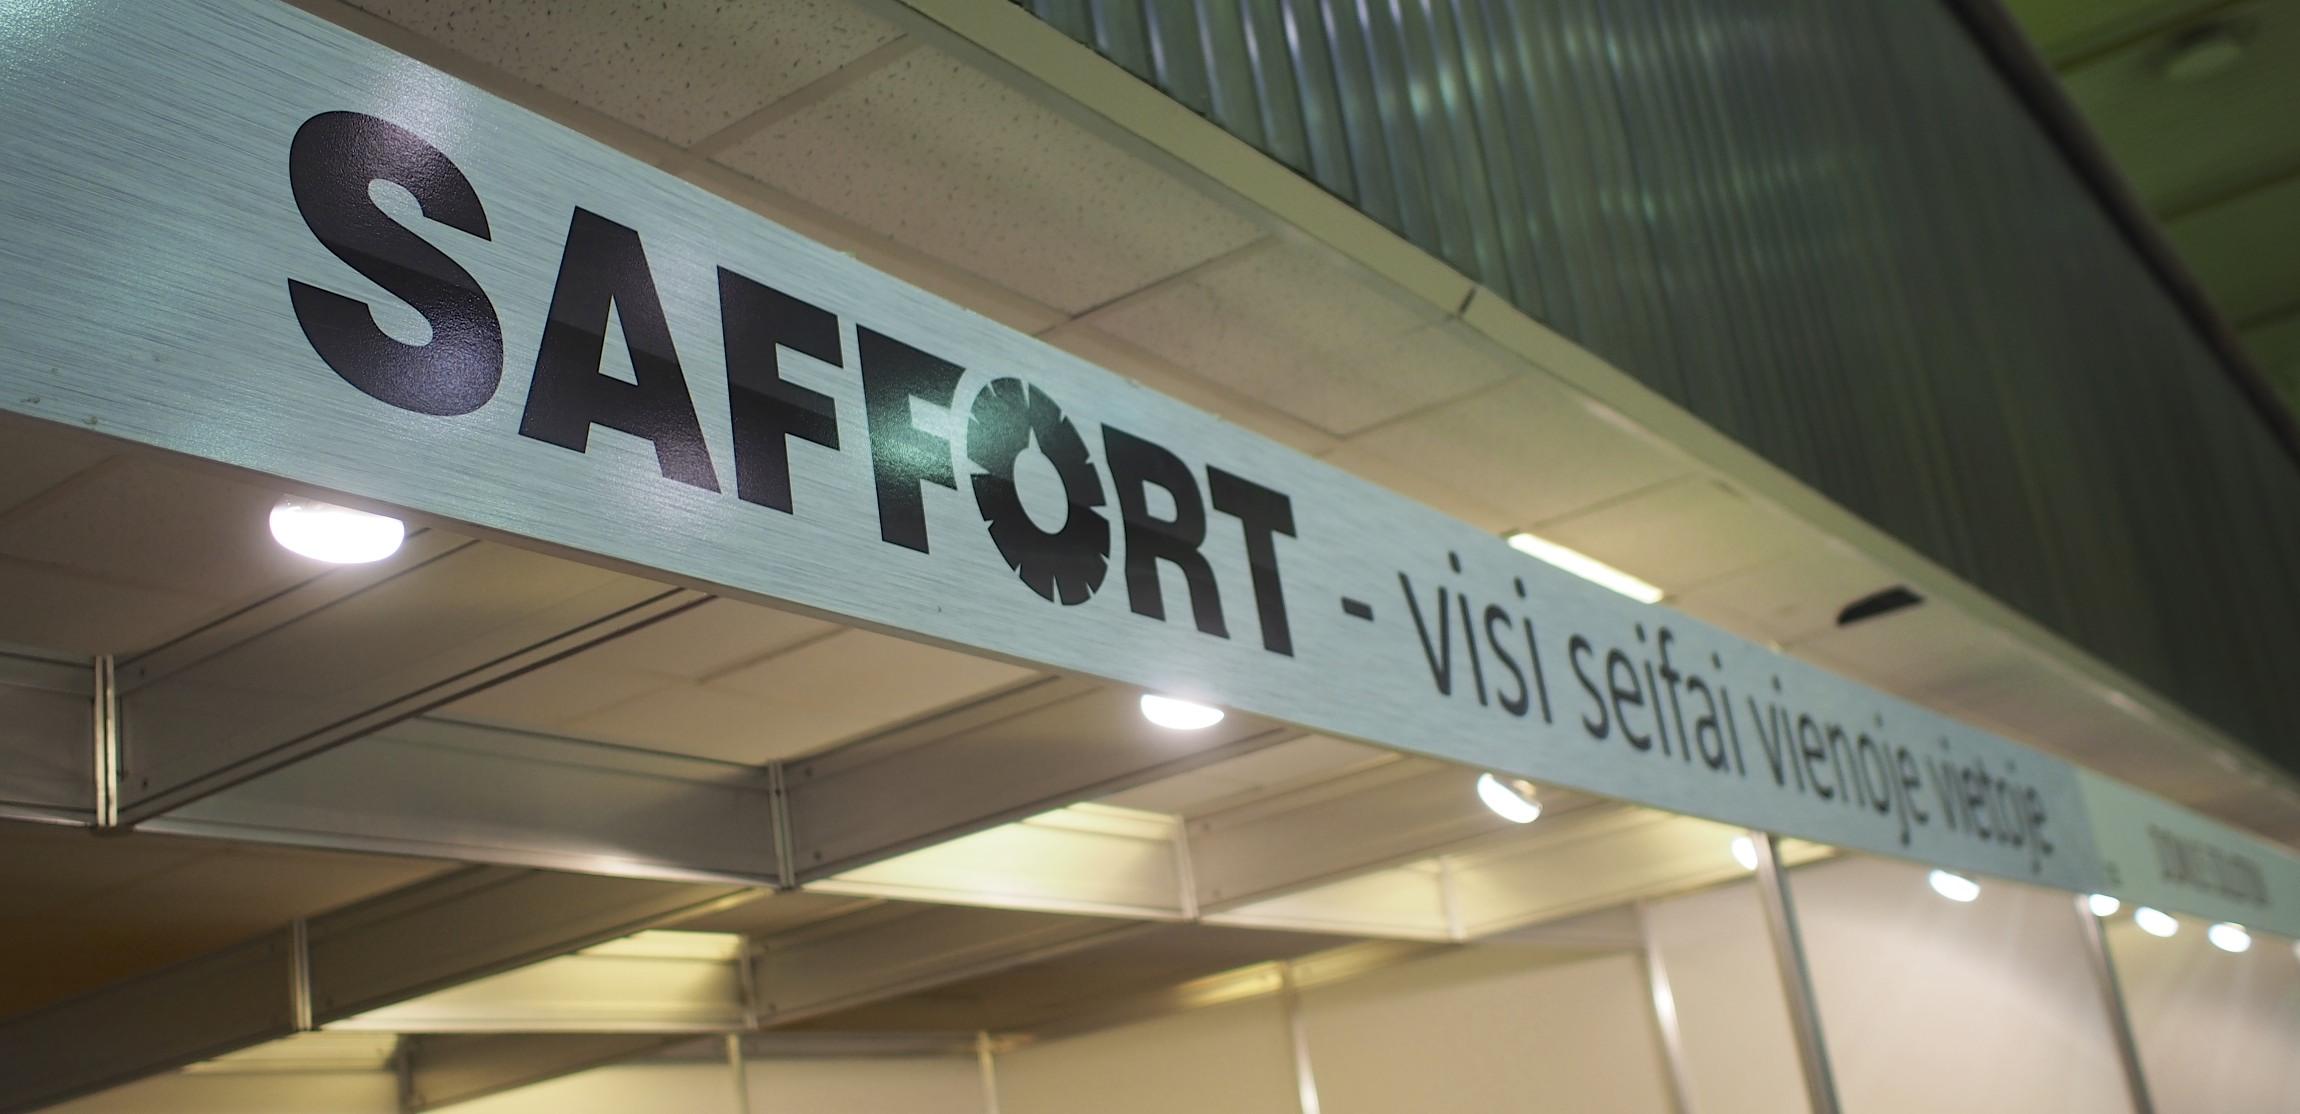 SAFFORT parodoje RESTA 2012